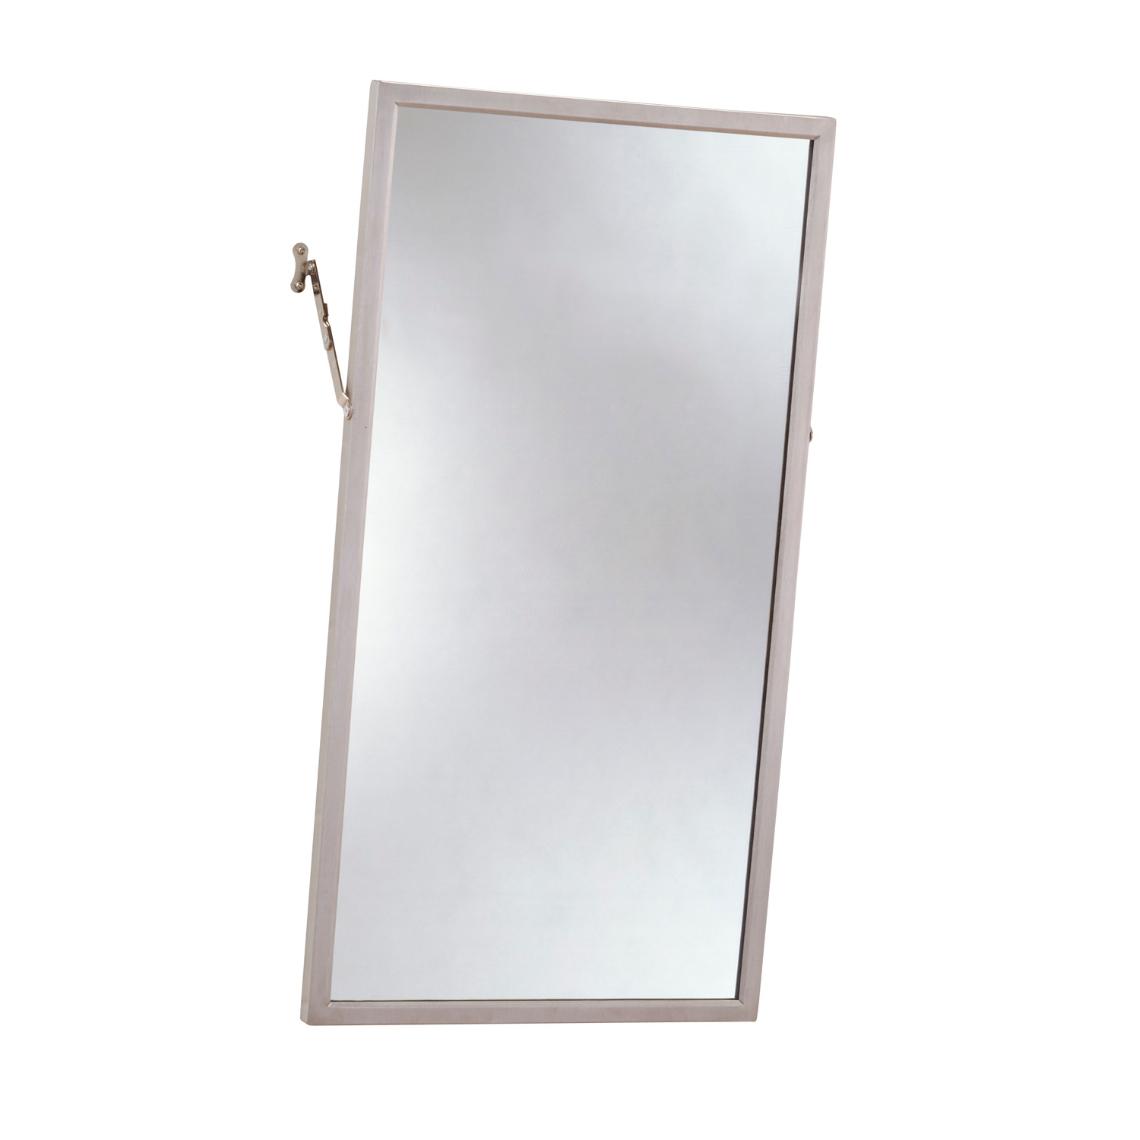 294 Angle Frame 2 Position Tilt Mirror